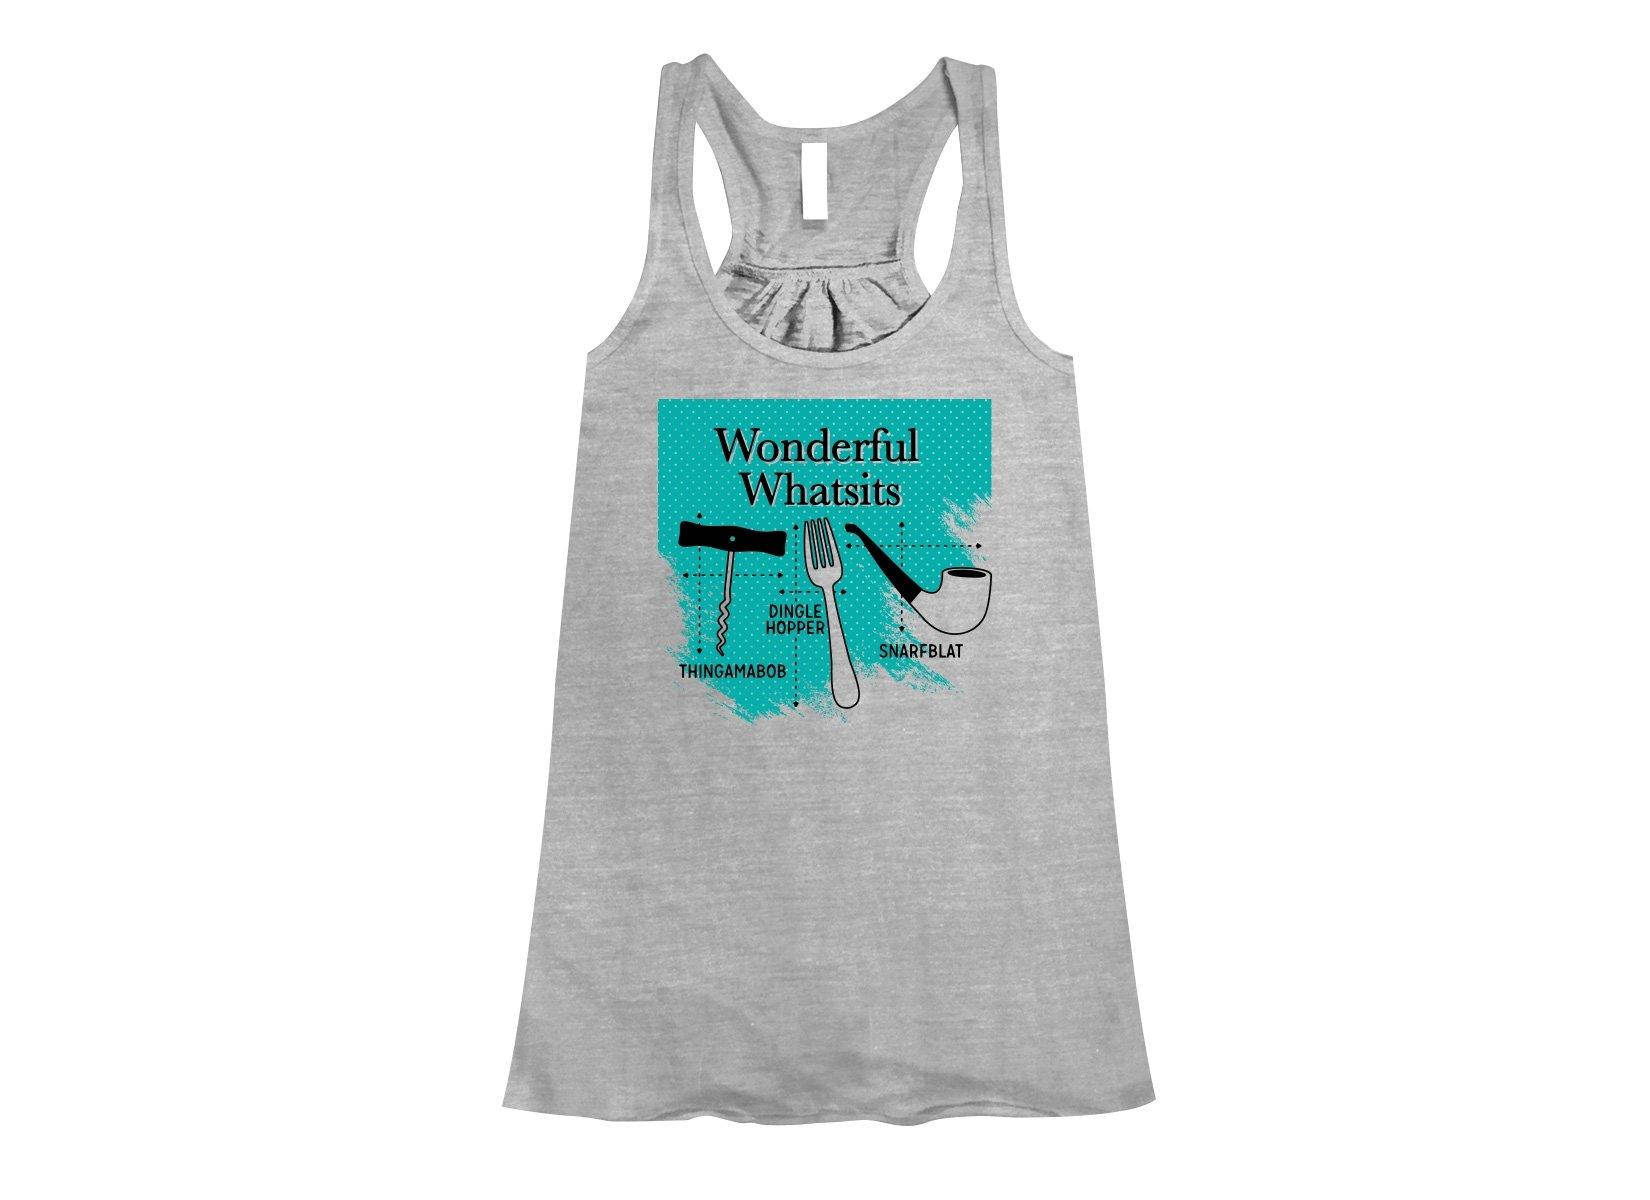 Wonderful Whatsits on Womens Tanks T-Shirt